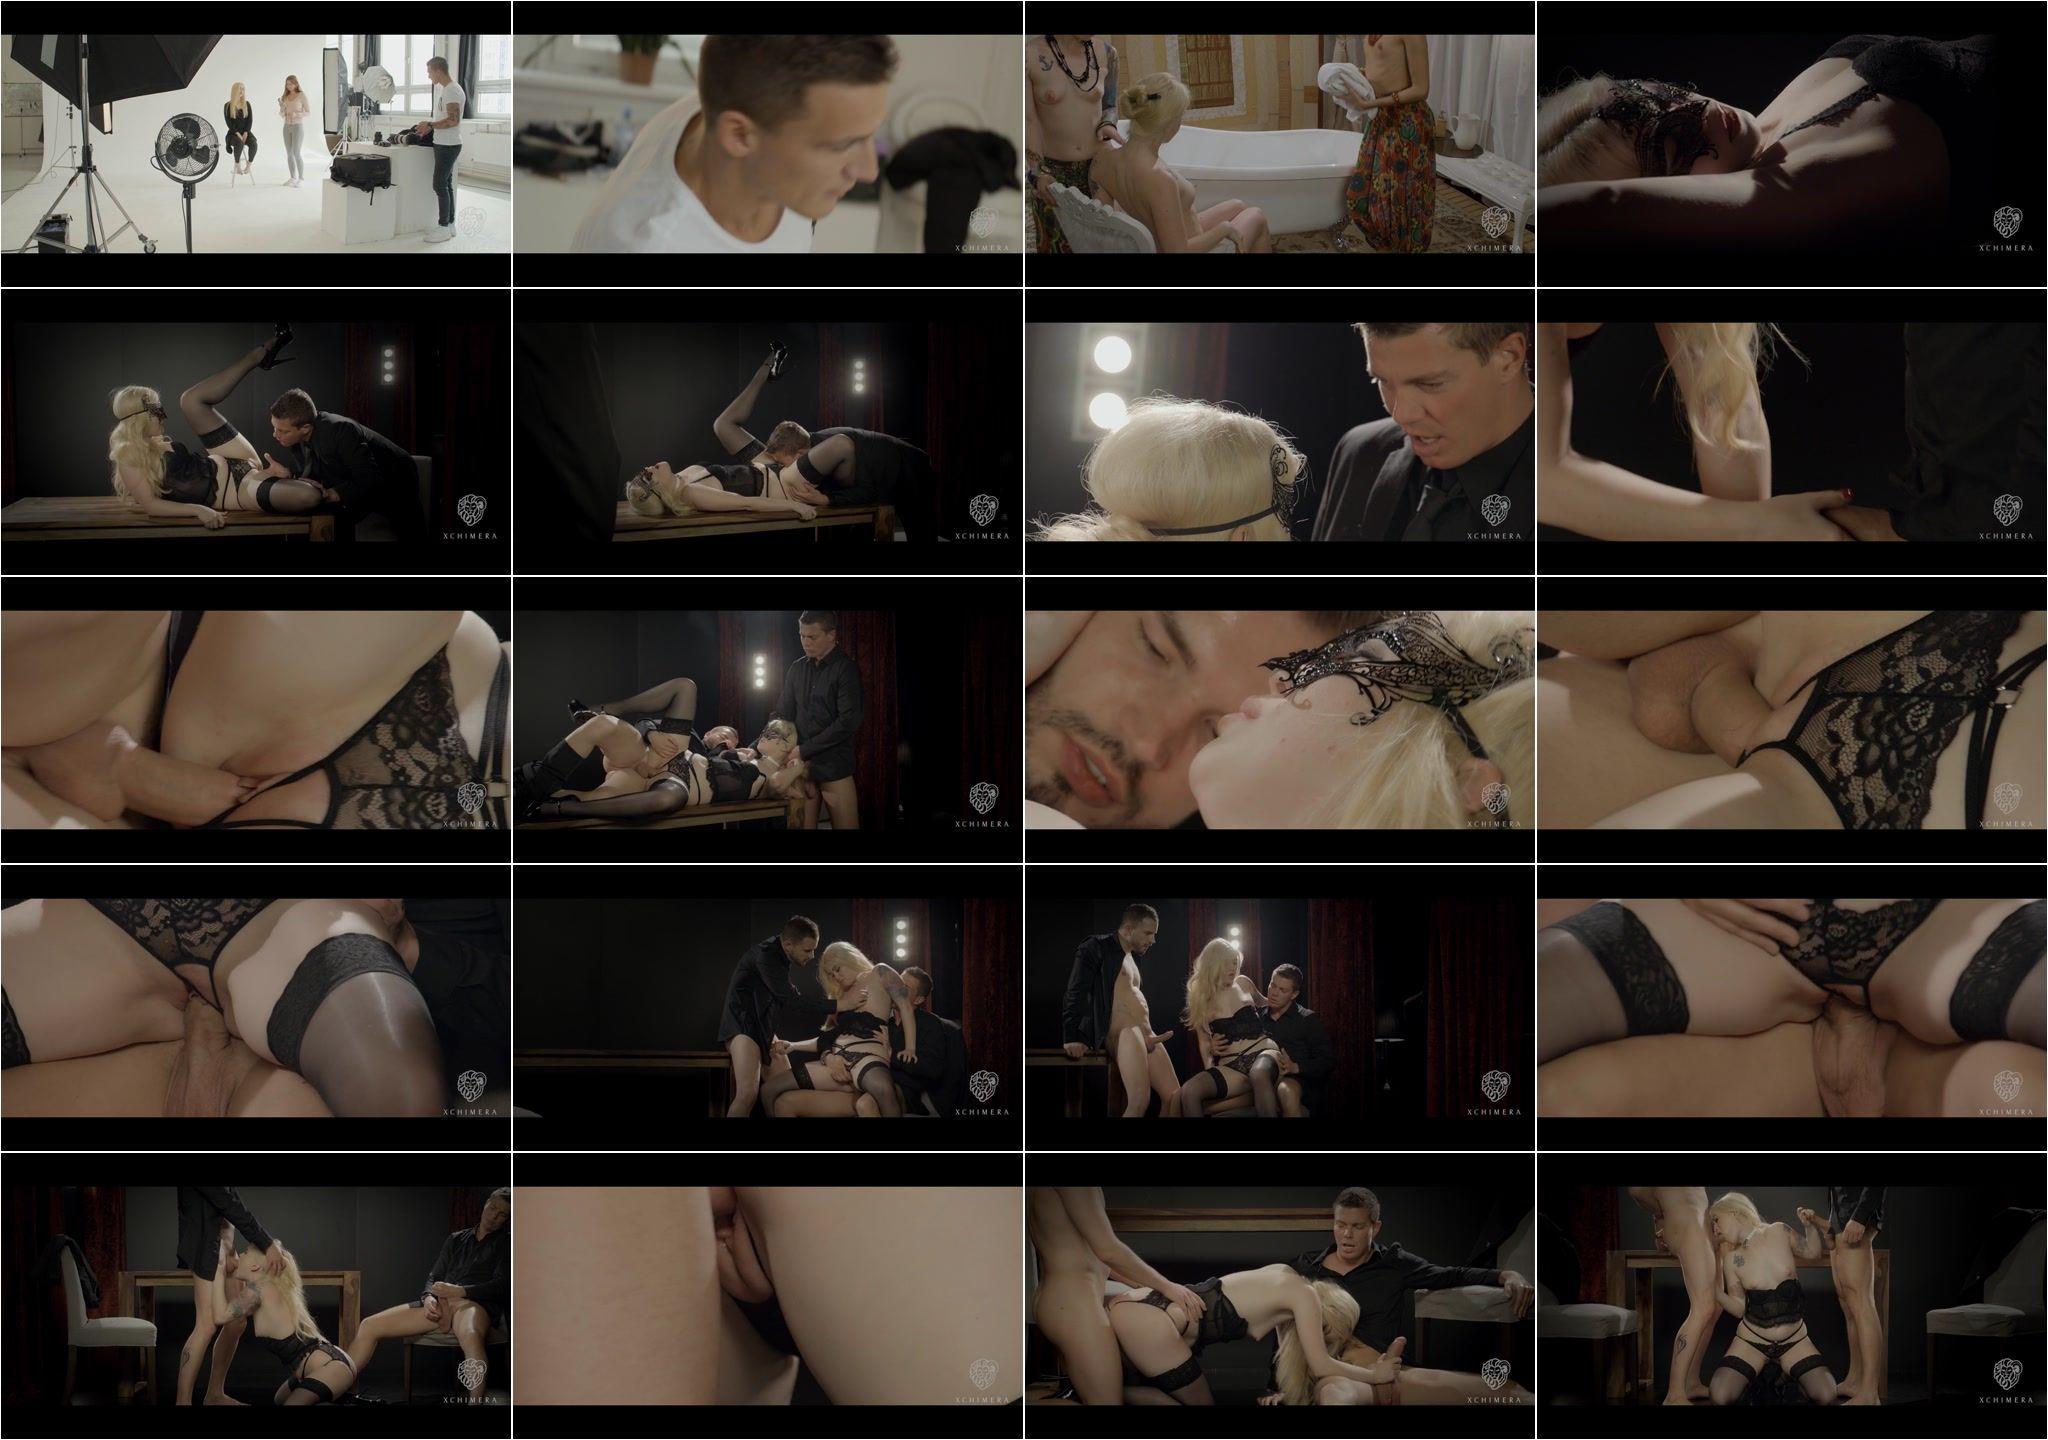 gonzo sex videos